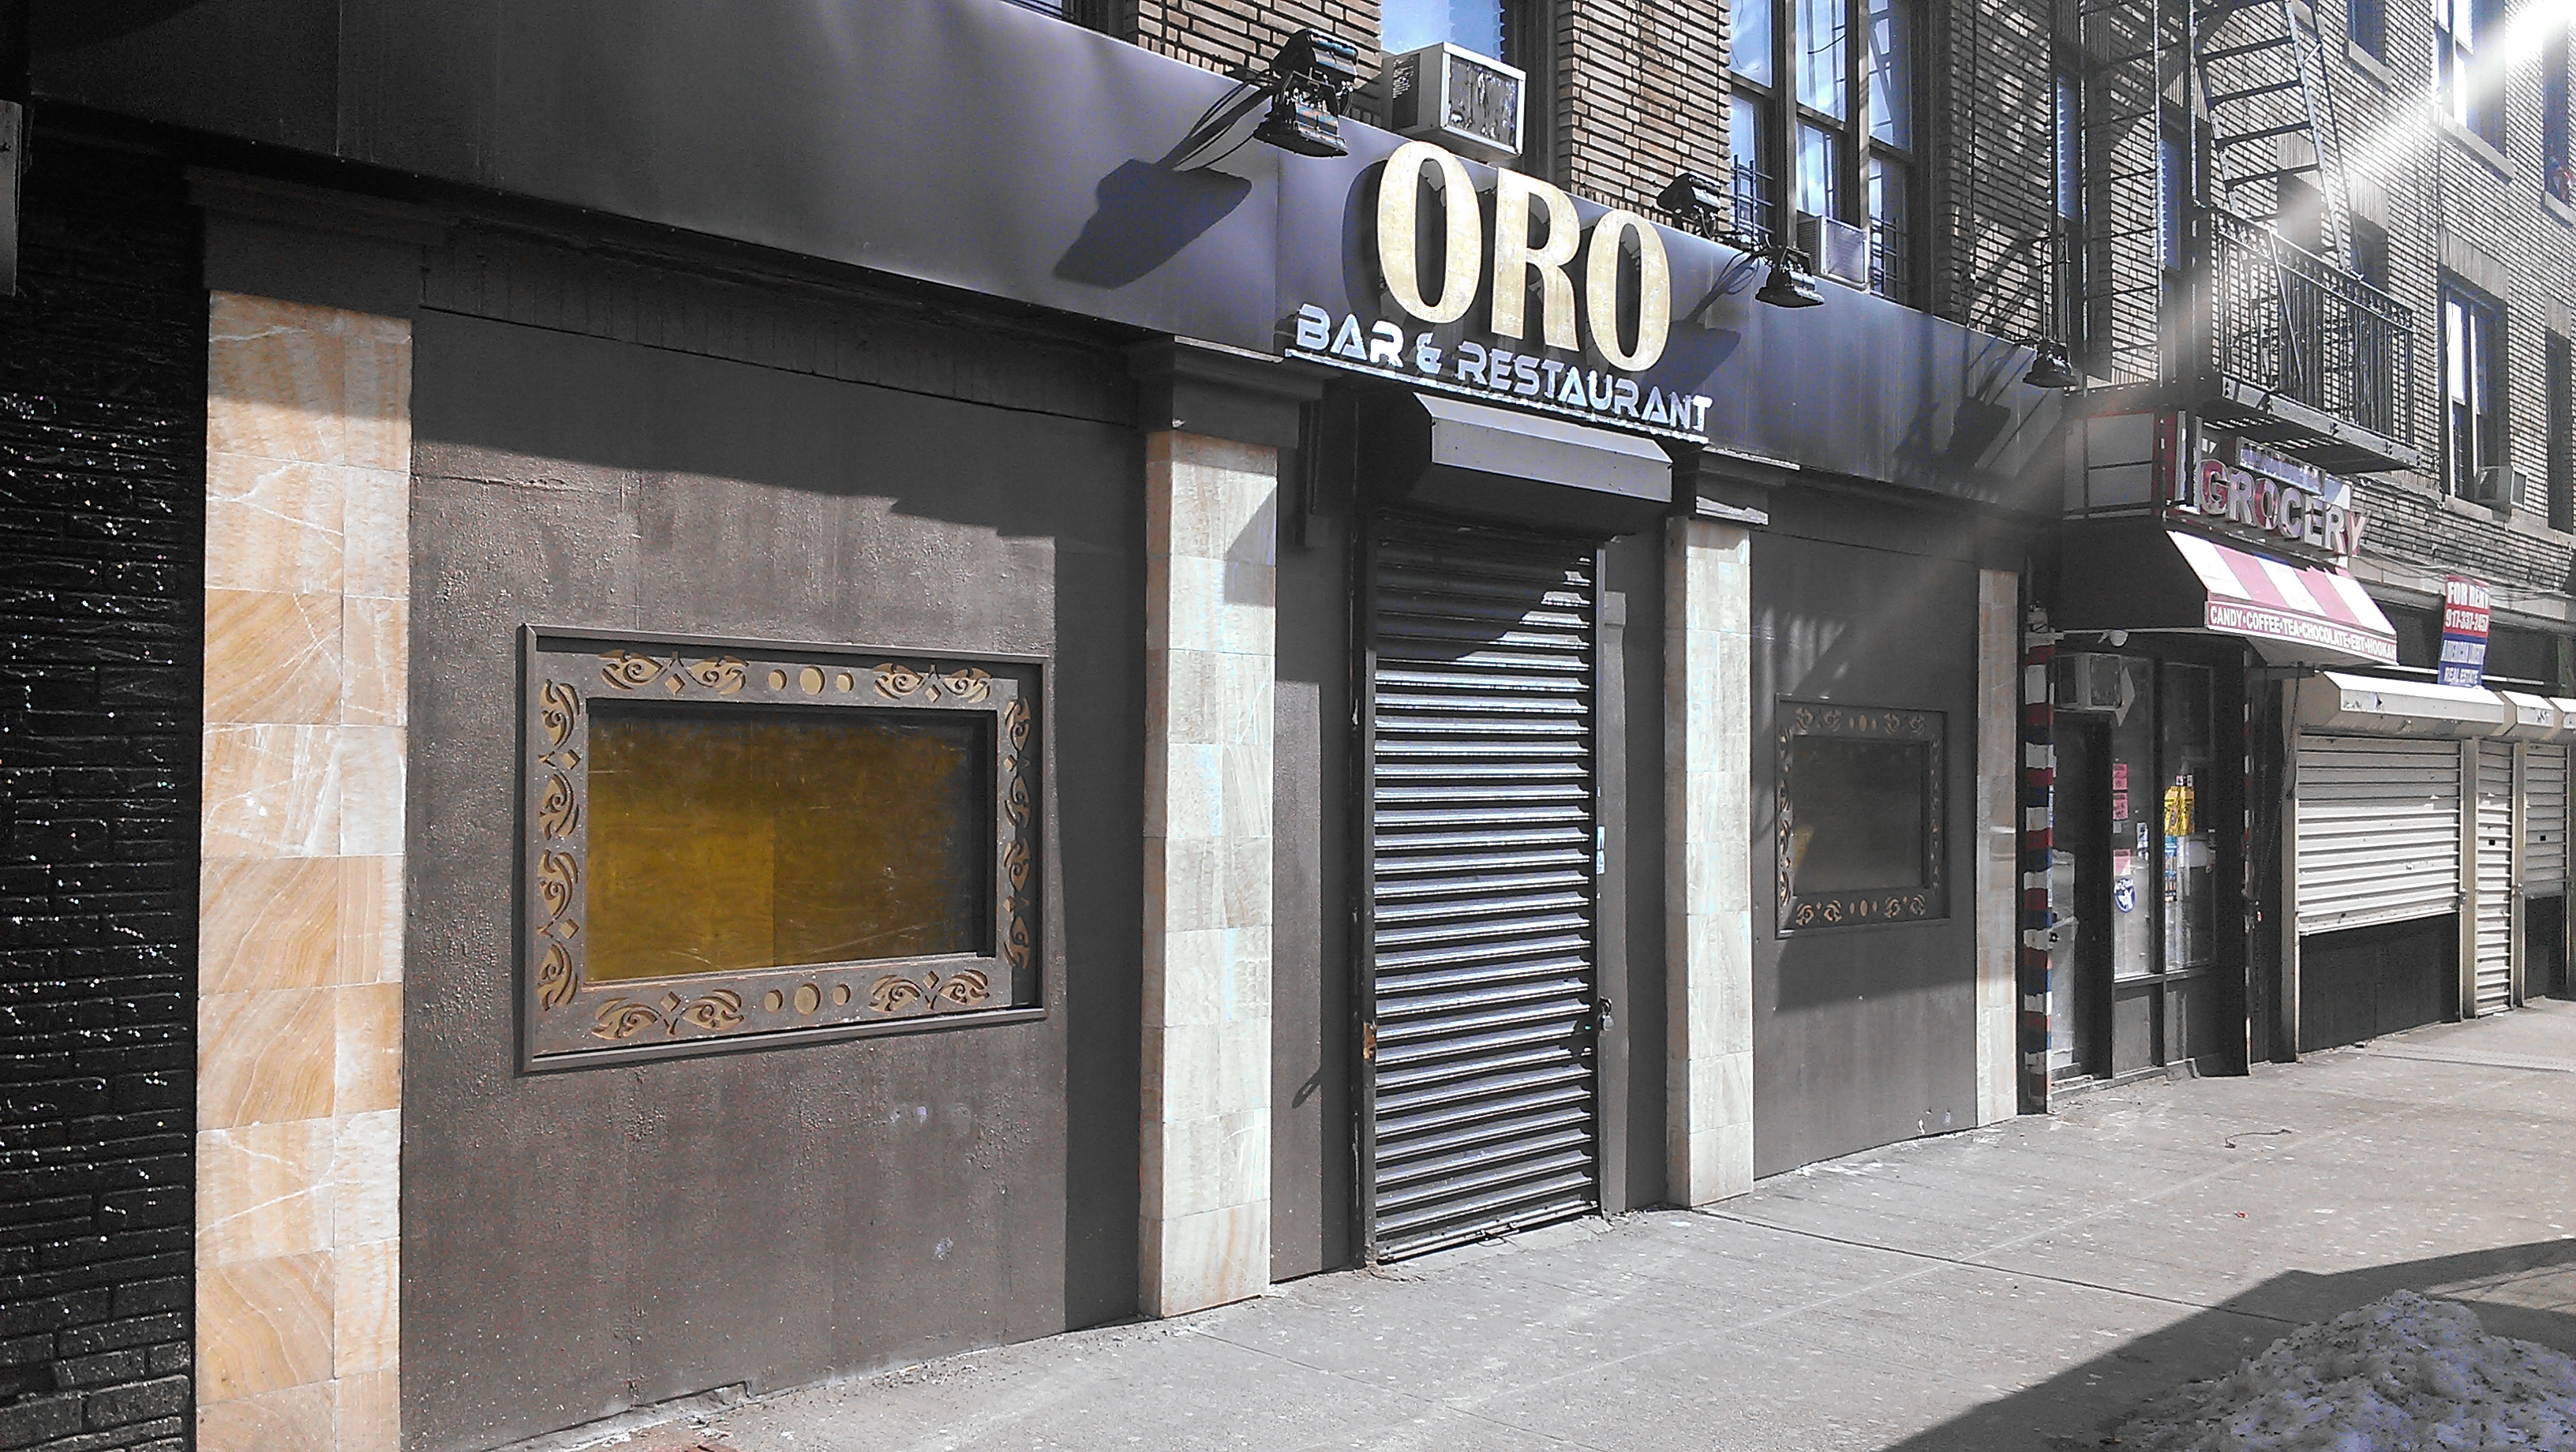 Community board demands bars shape up